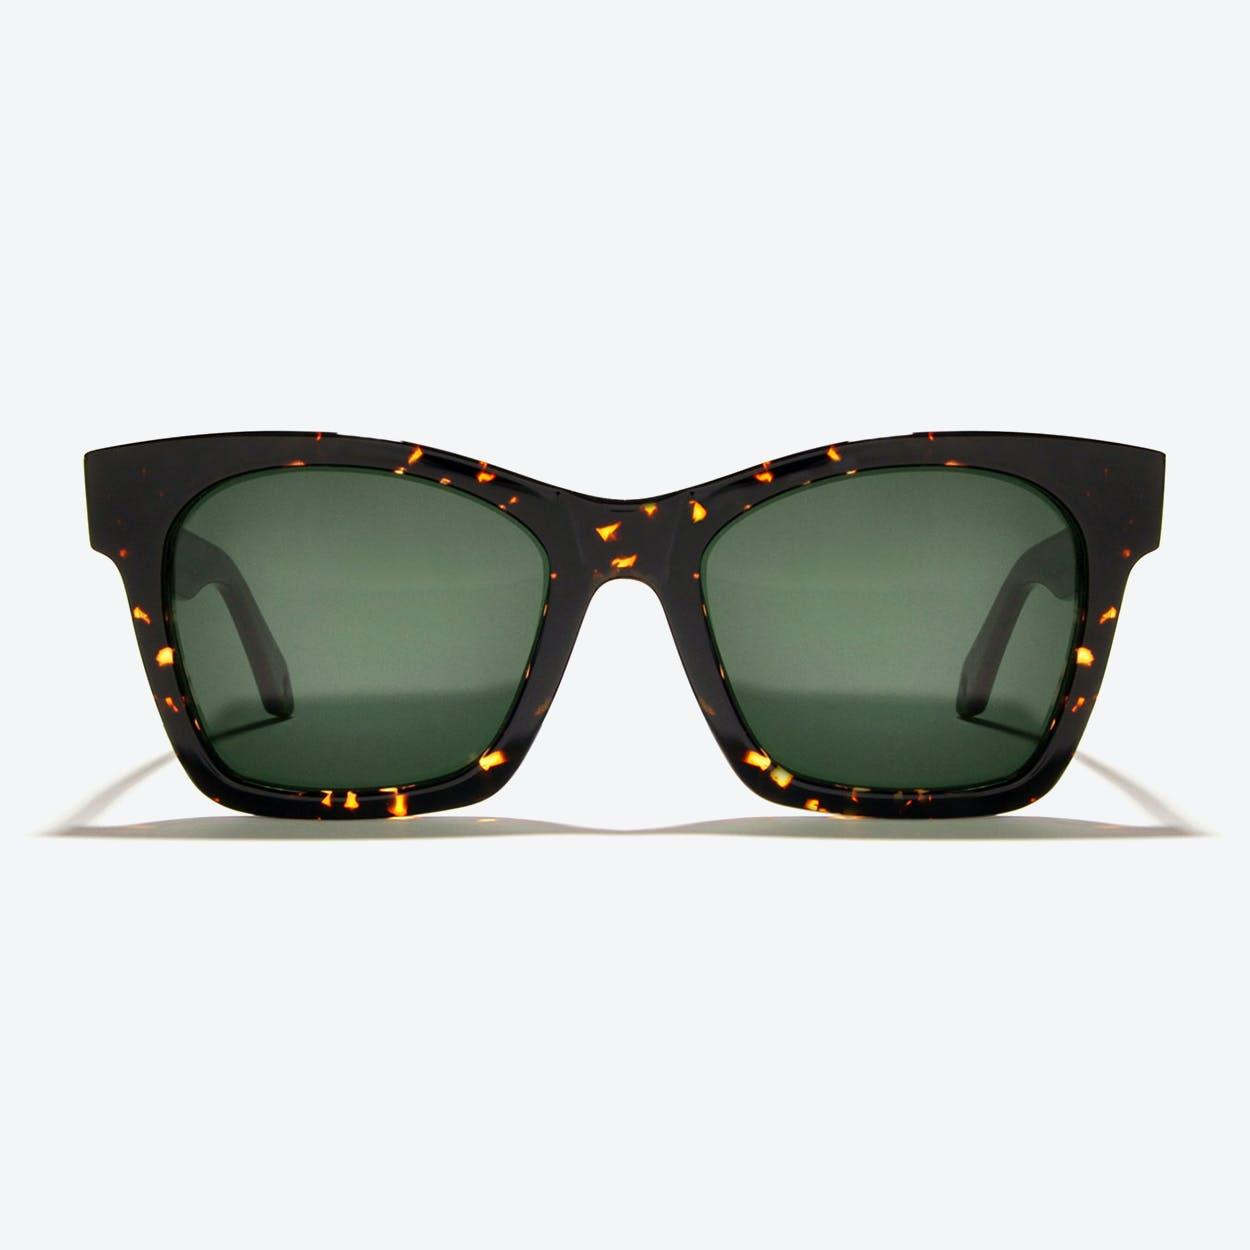 Draco Sunglasses in Tortoise